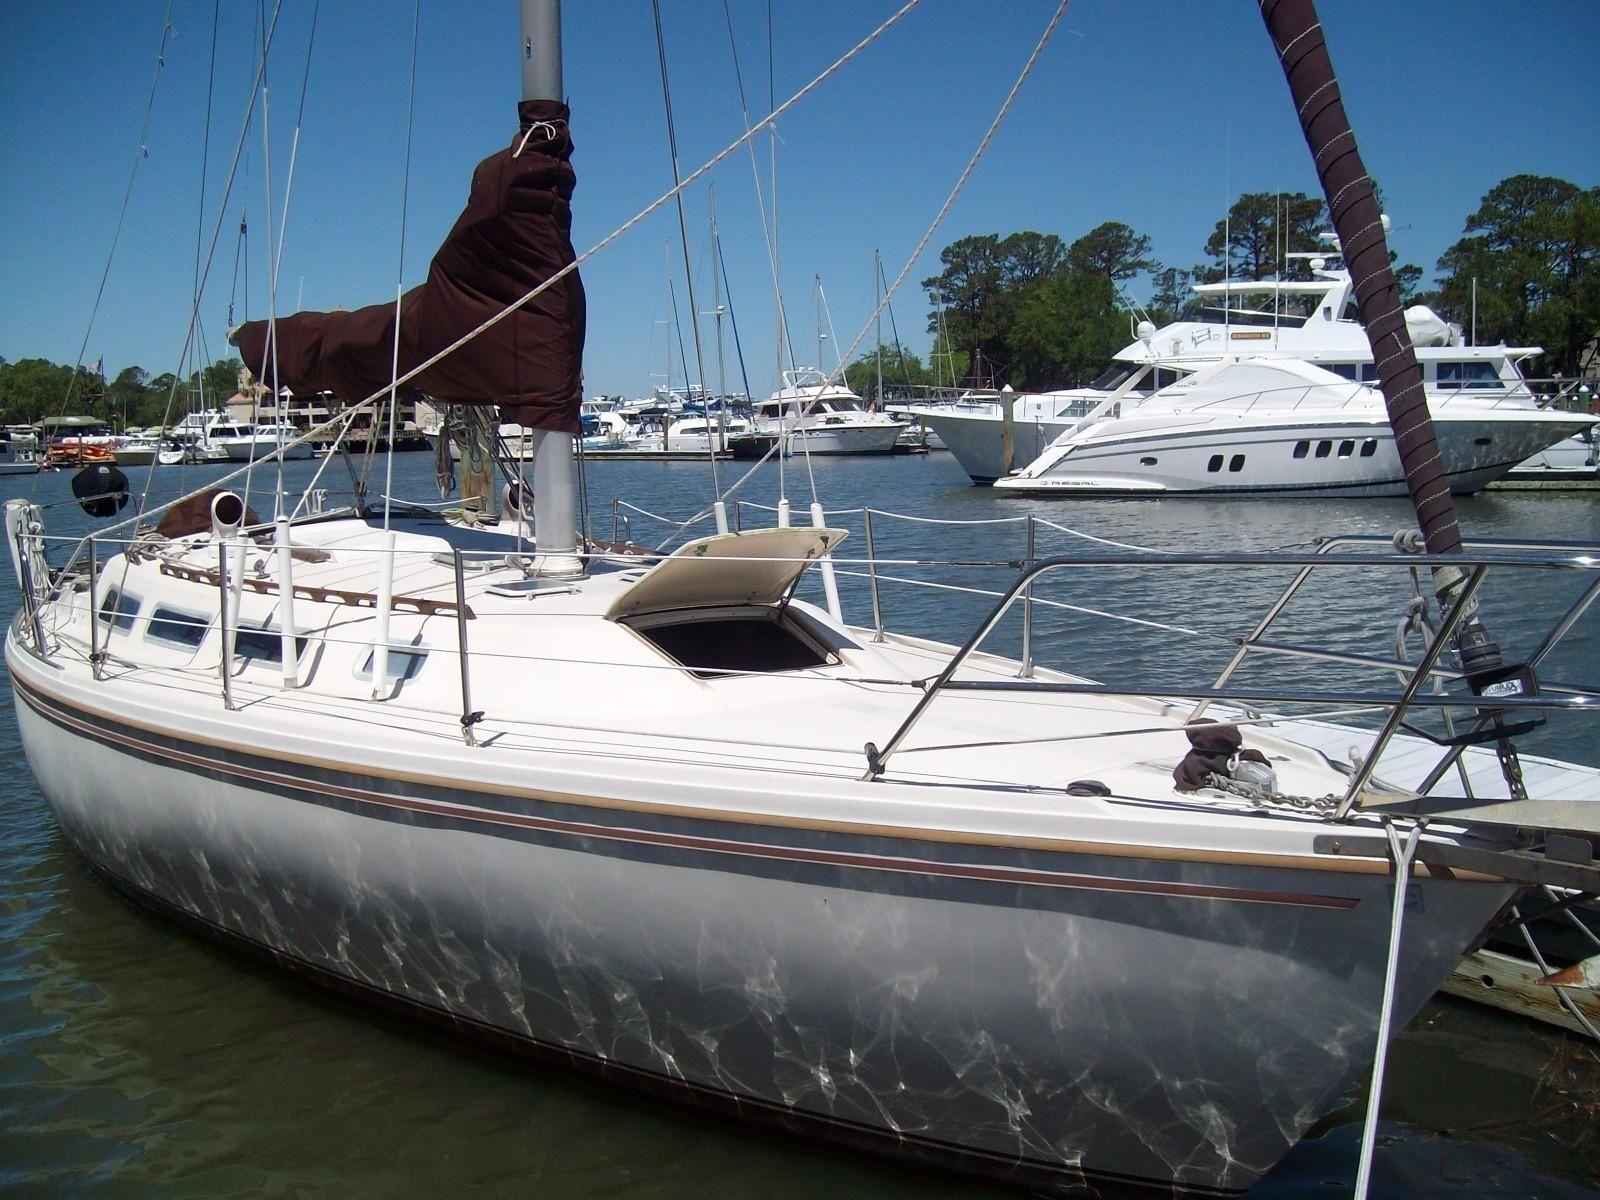 Craigslist Hilton Head Island >> Sailboat For Sale: Sailboat For Sale Hilton Head